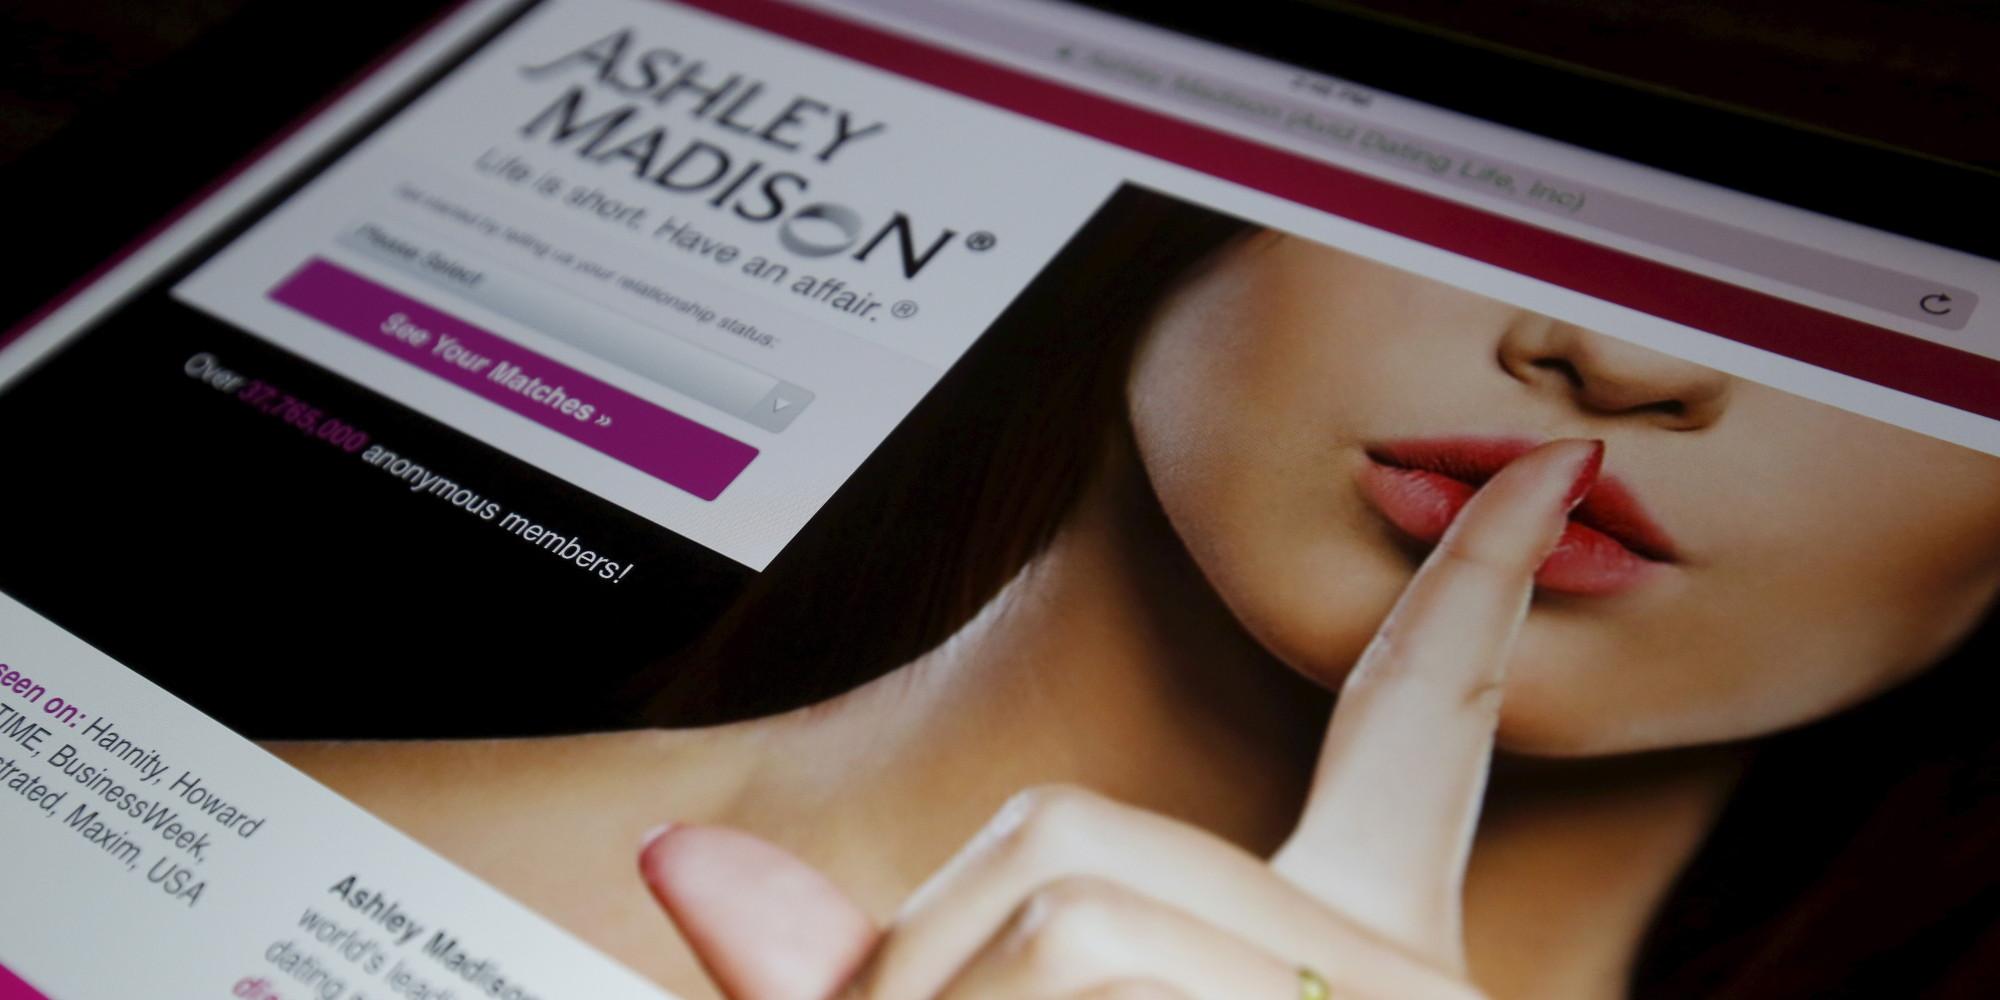 Ashley madison desktop version